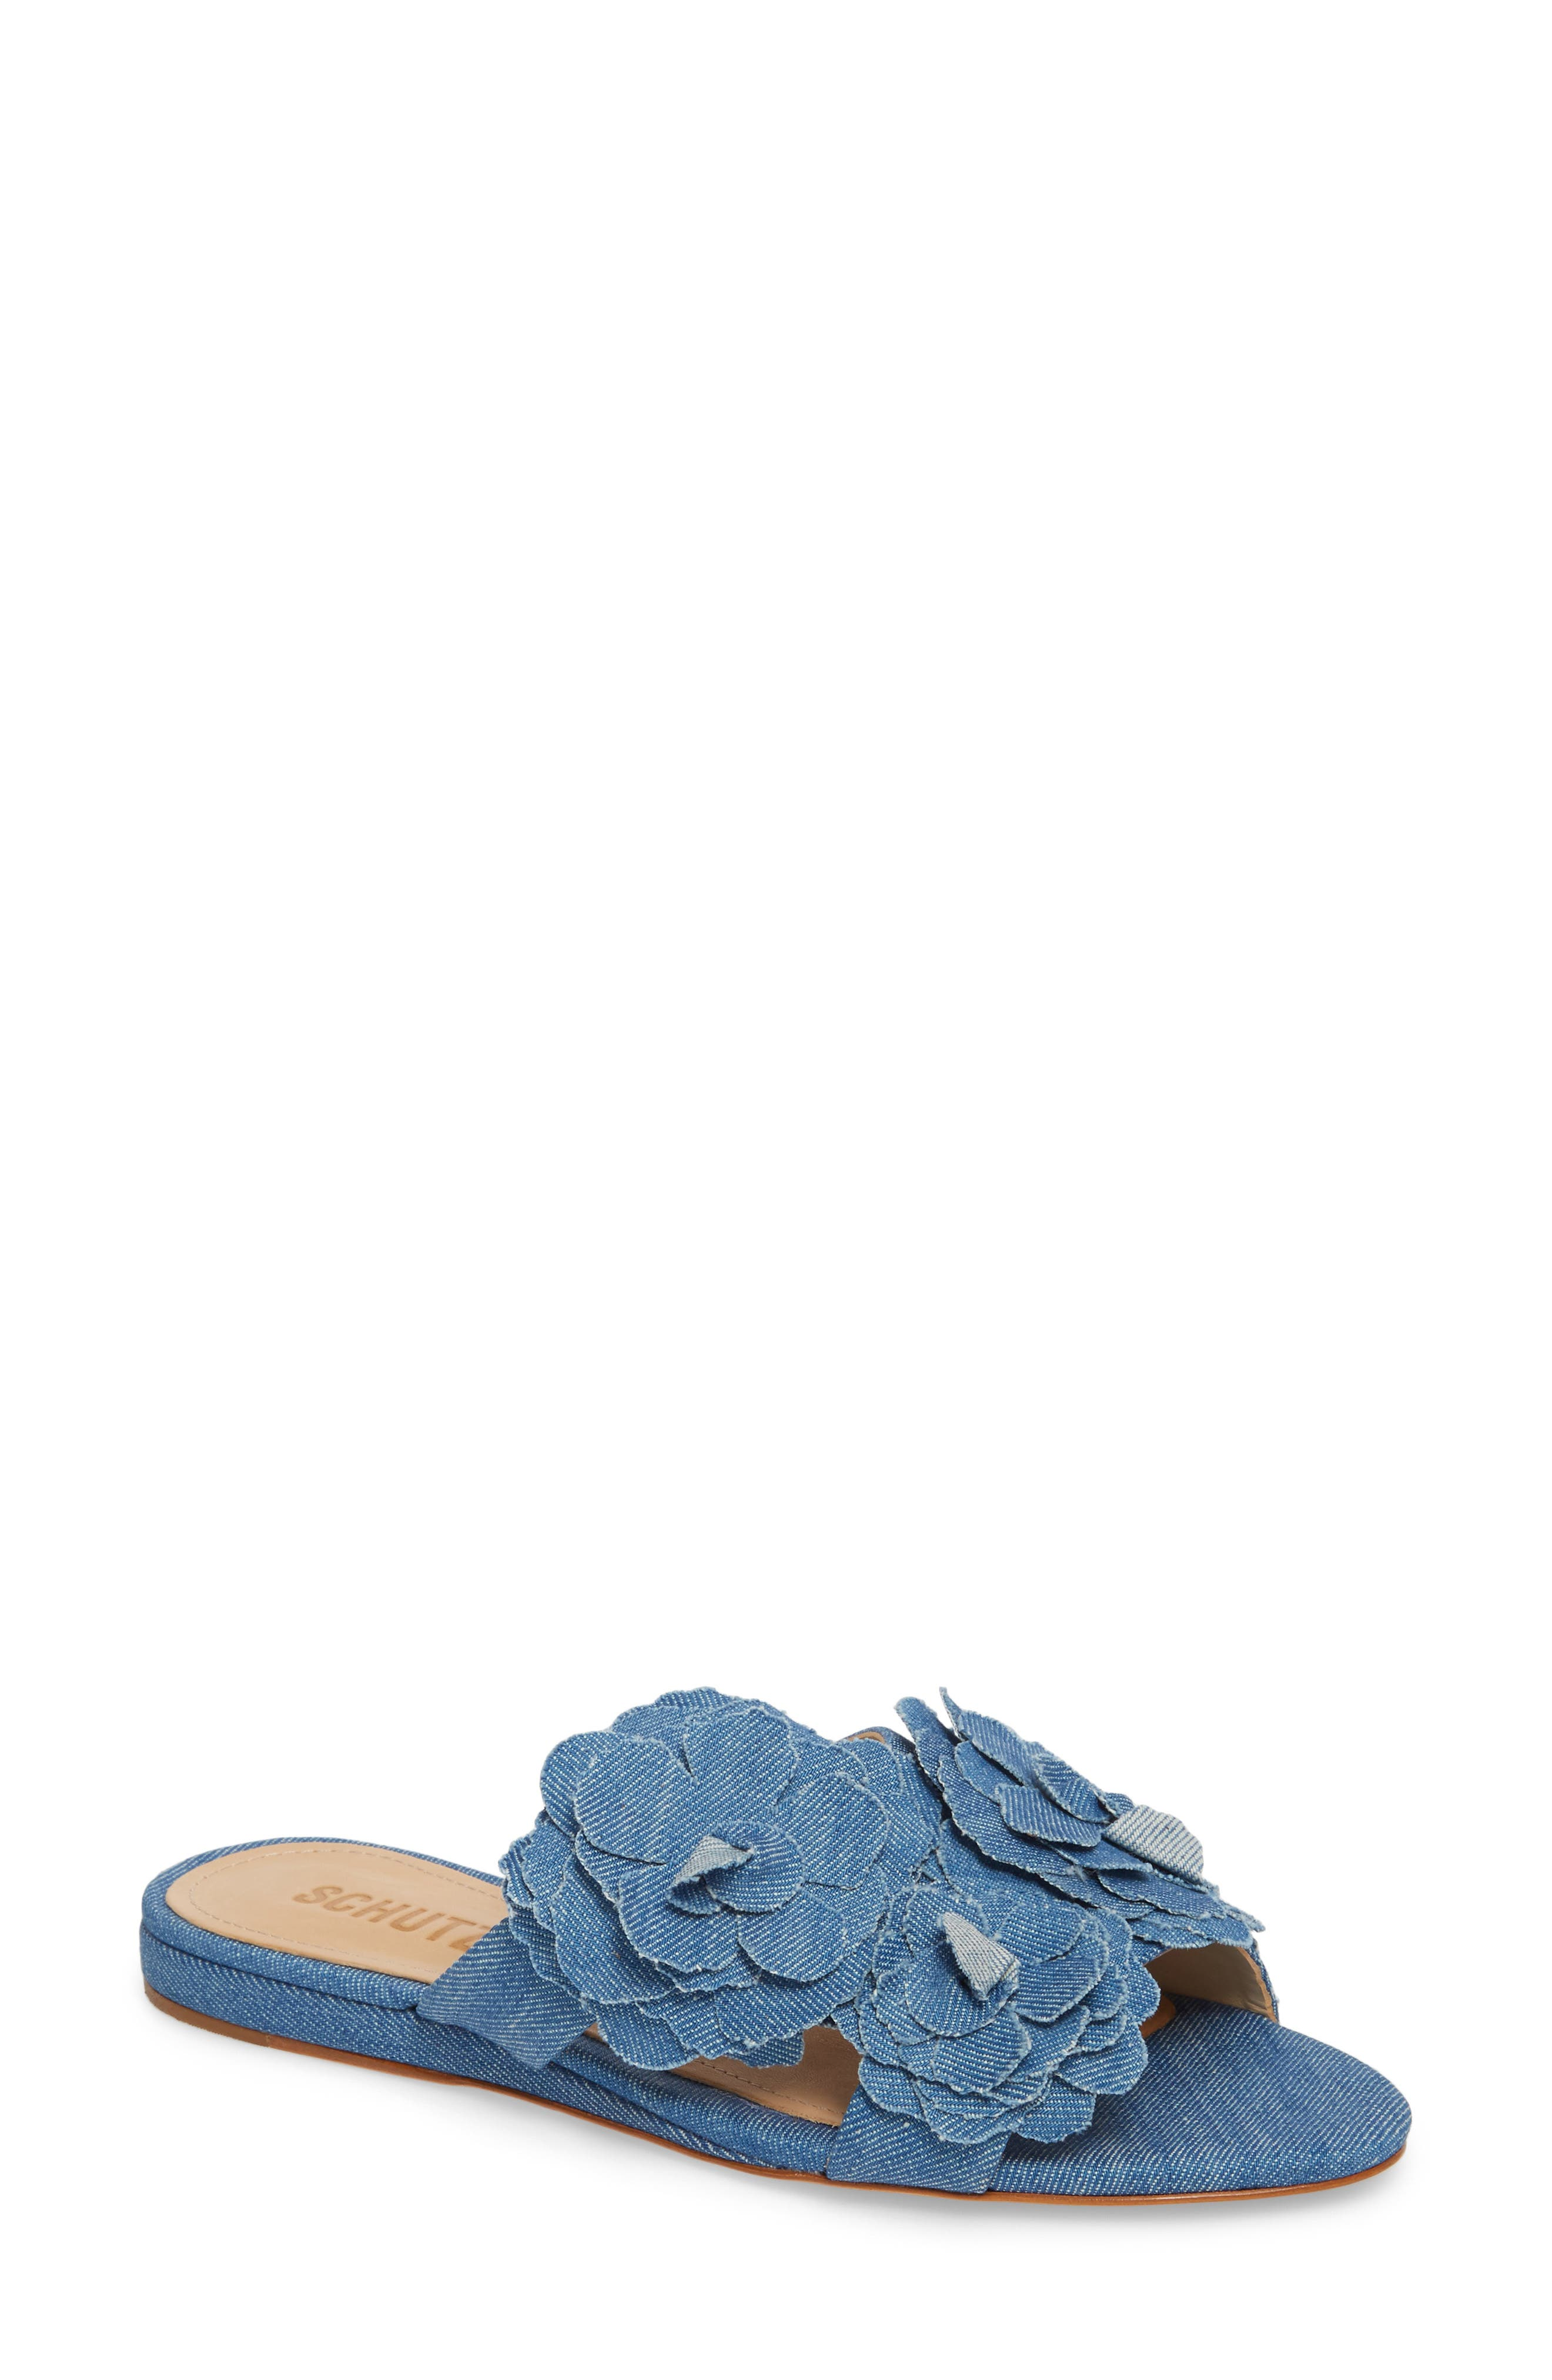 Ilaria Flower Sandal,                         Main,                         color, LIGHT BLUE